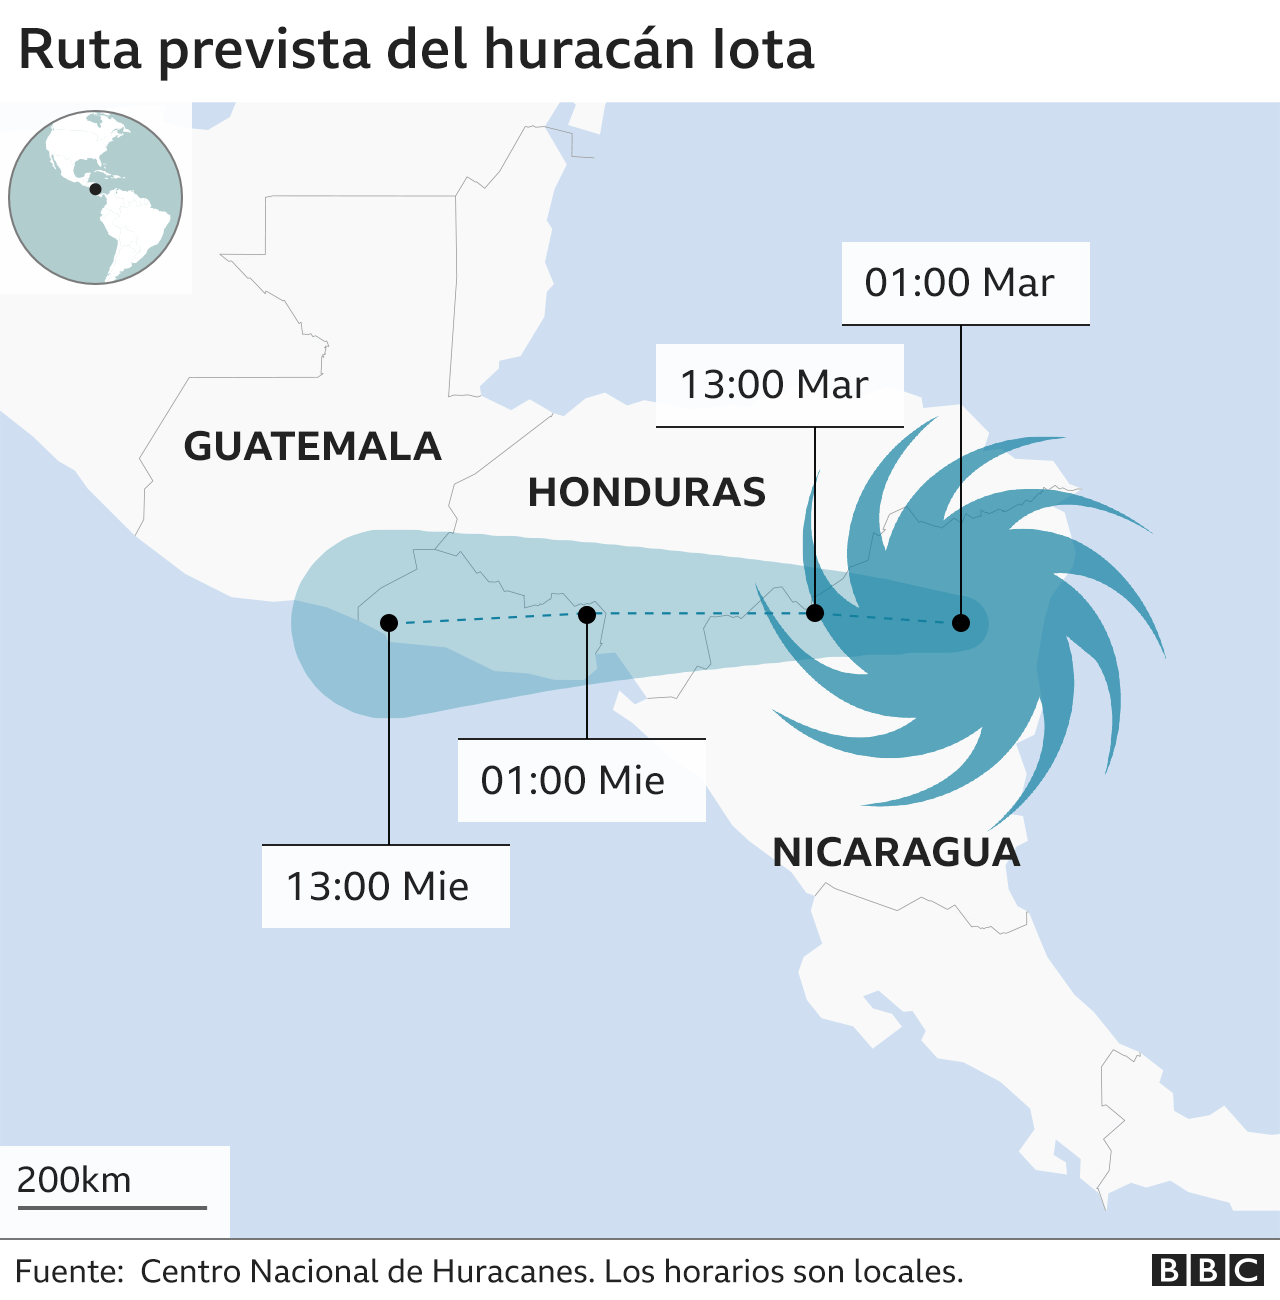 Mapa de la trayectoria del huracán Iota